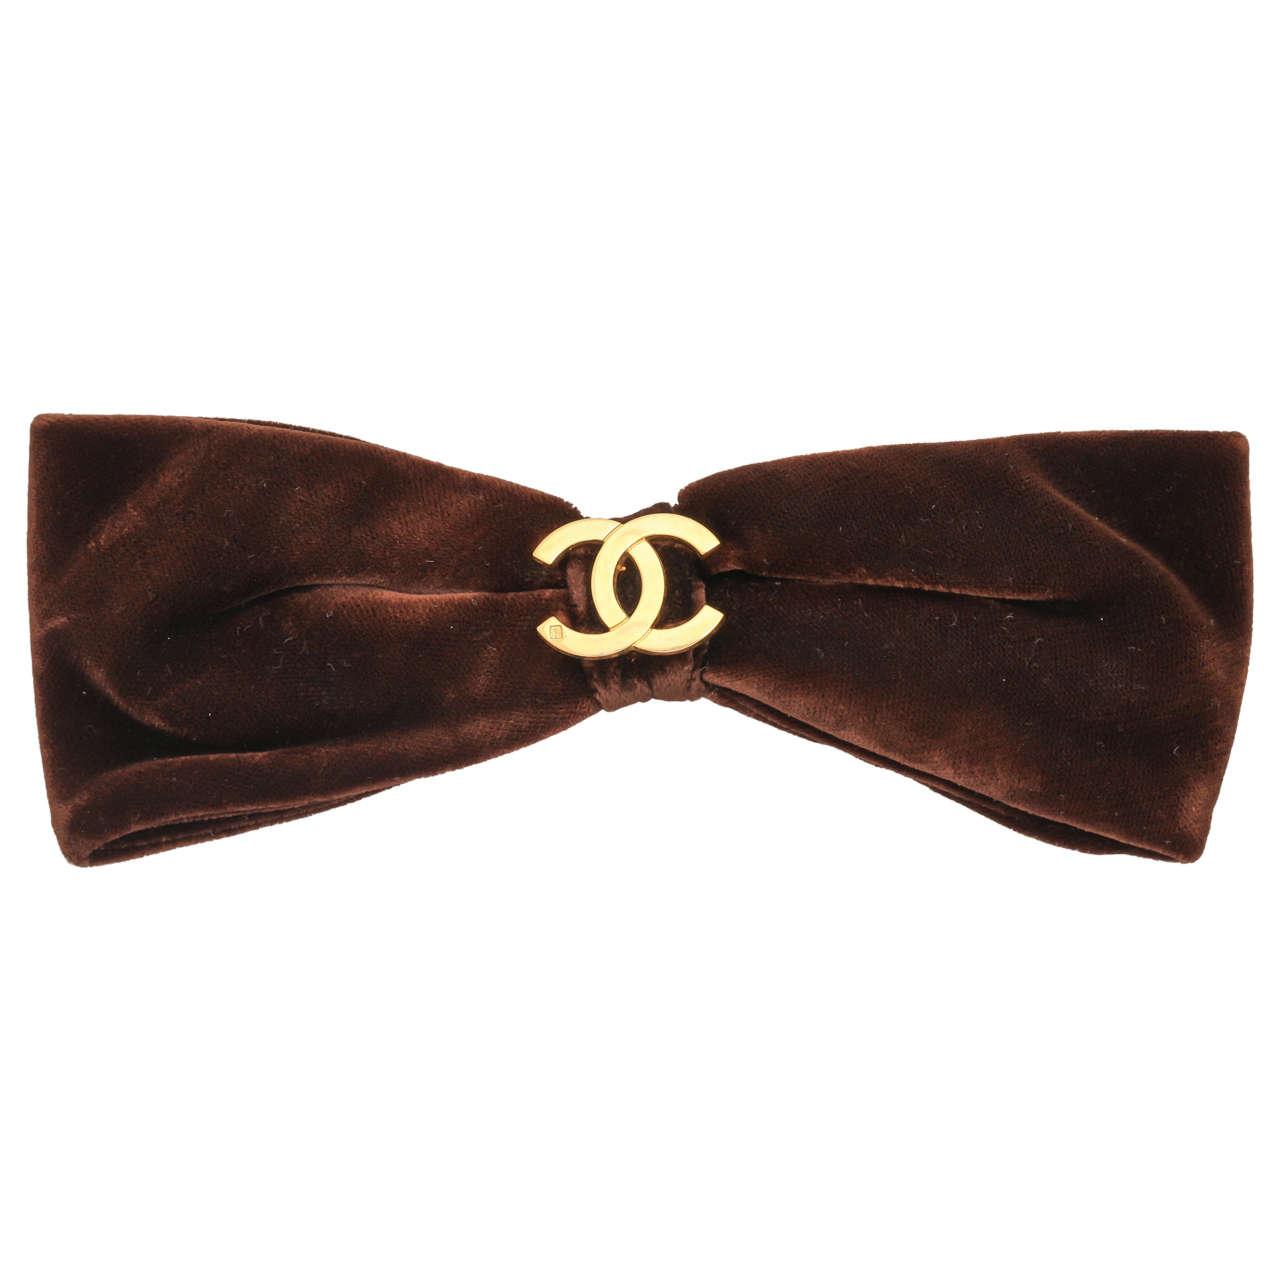 Chanel CC Large Brown Velvet Bow Hair Clip 1